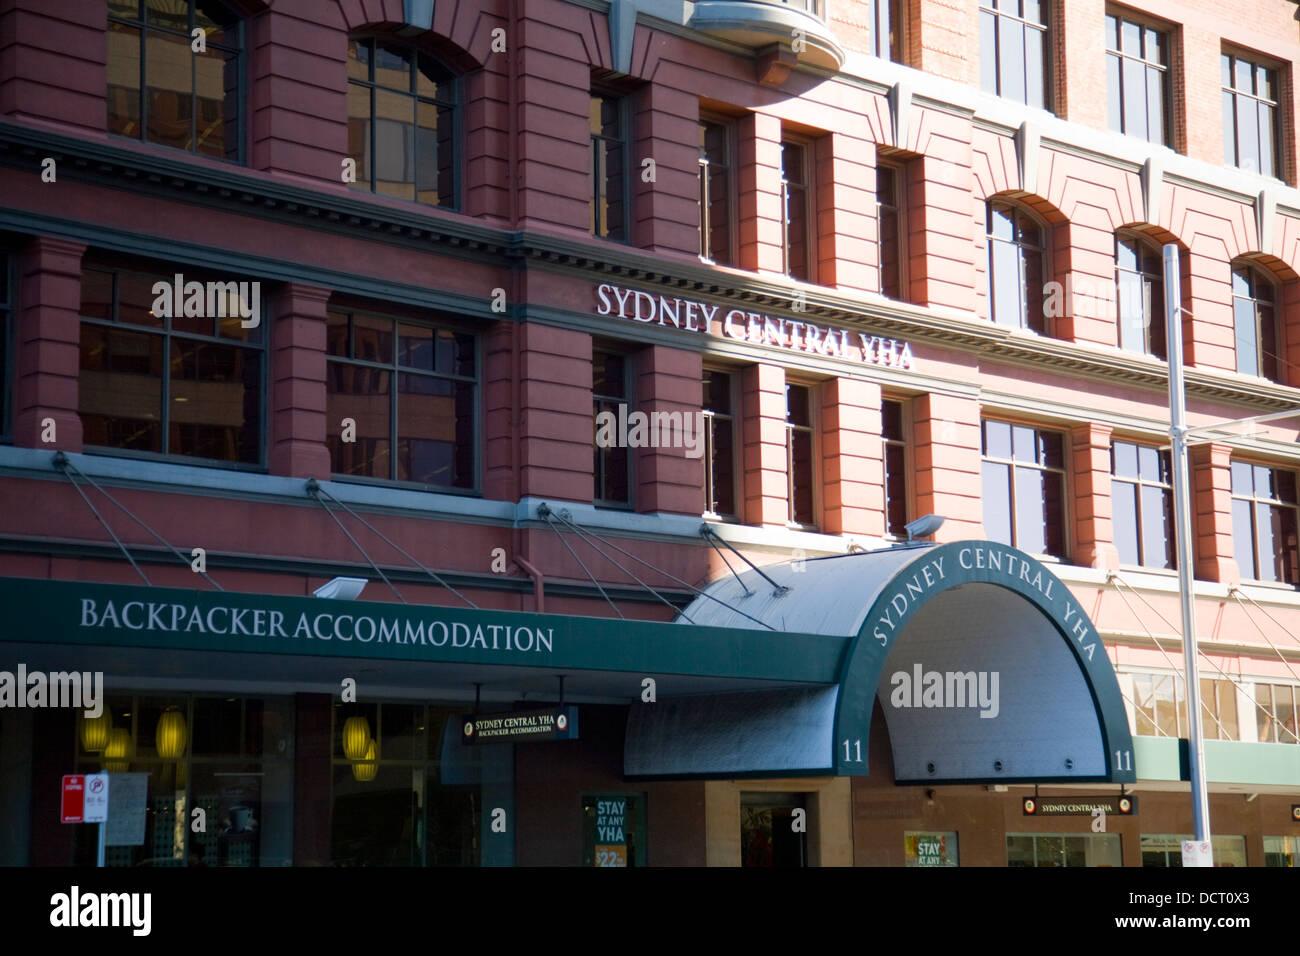 backpacker accomodation in sydney city centre - Stock Image